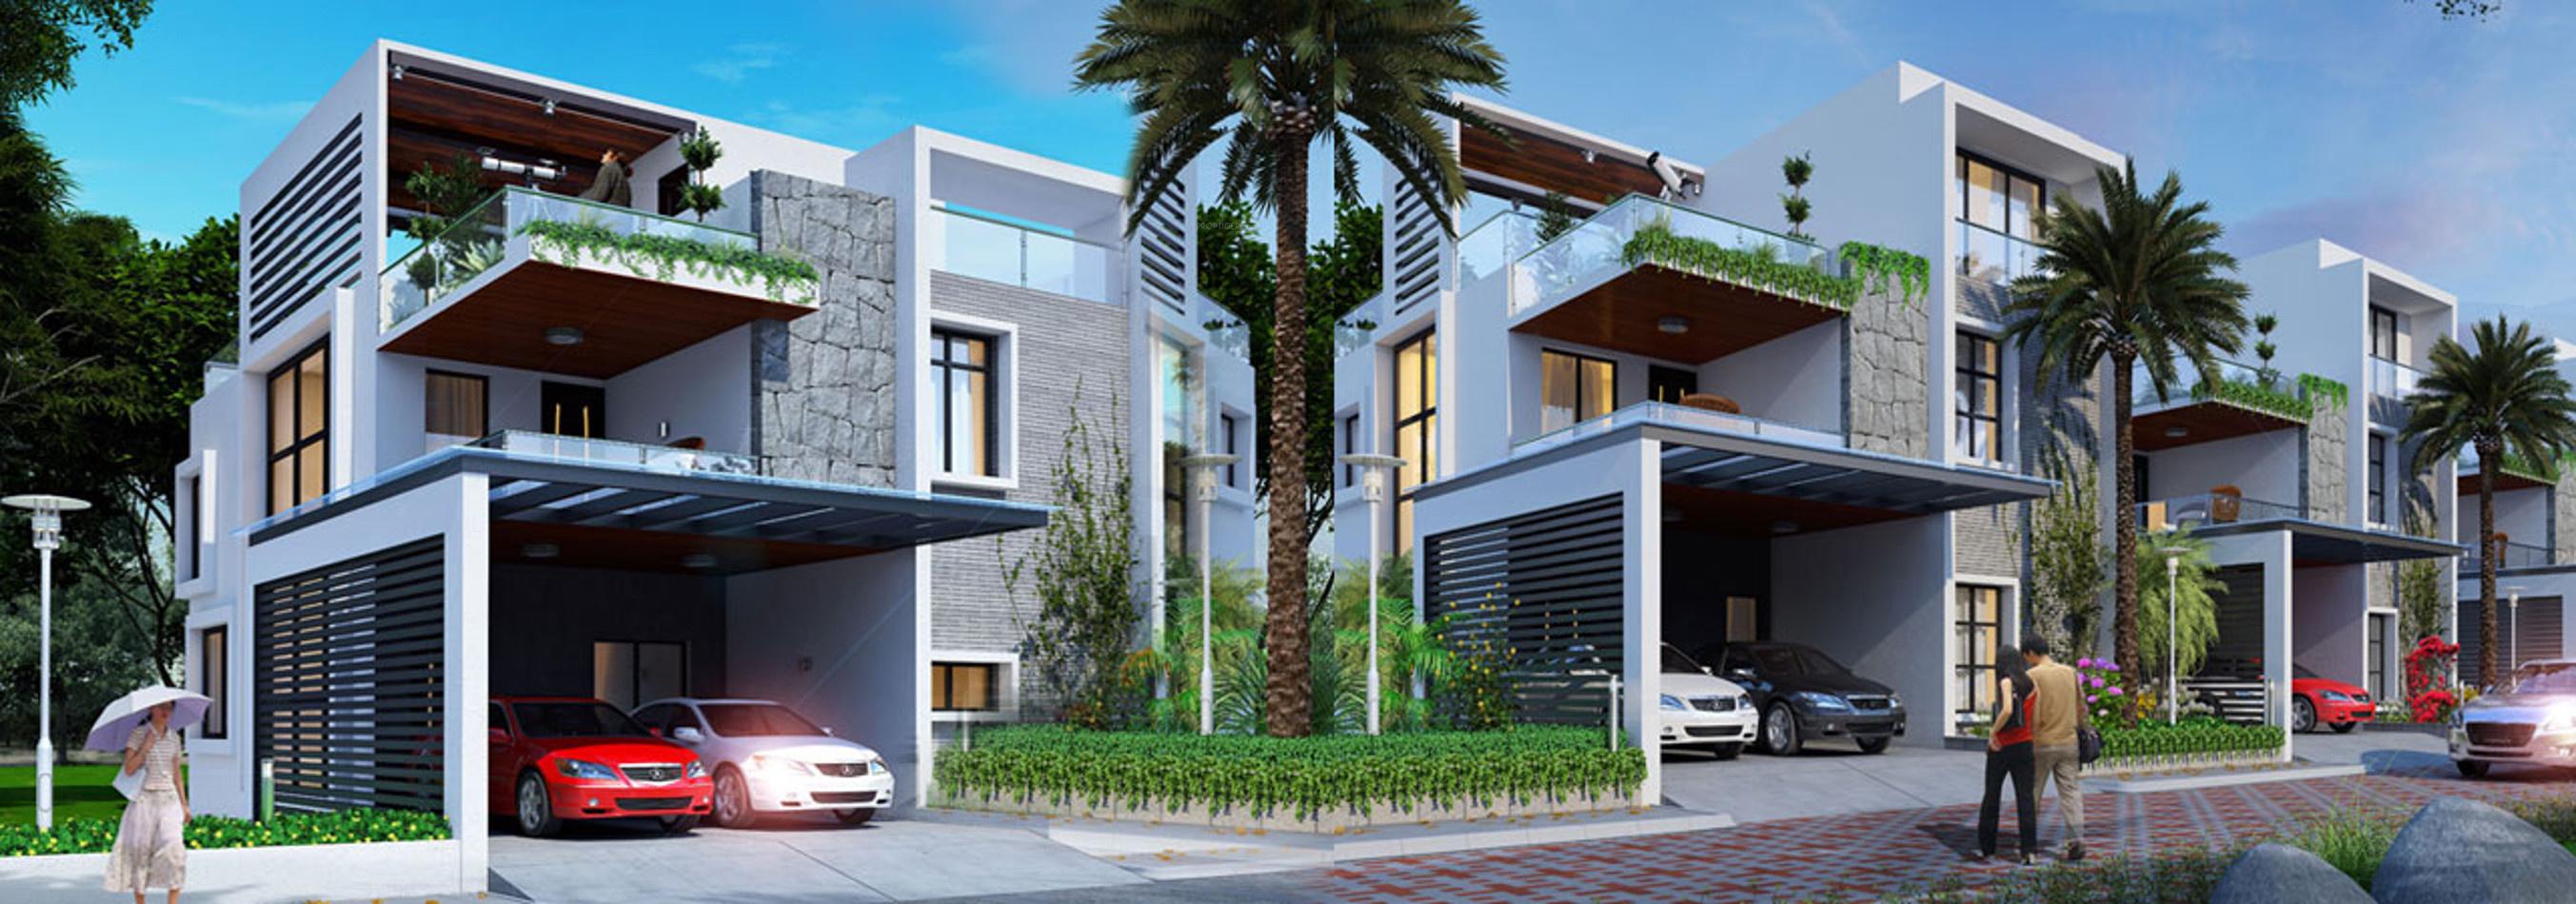 3024 sq ft 3 bhk 5t villa for sale in gardenia ventures for Villas firenze